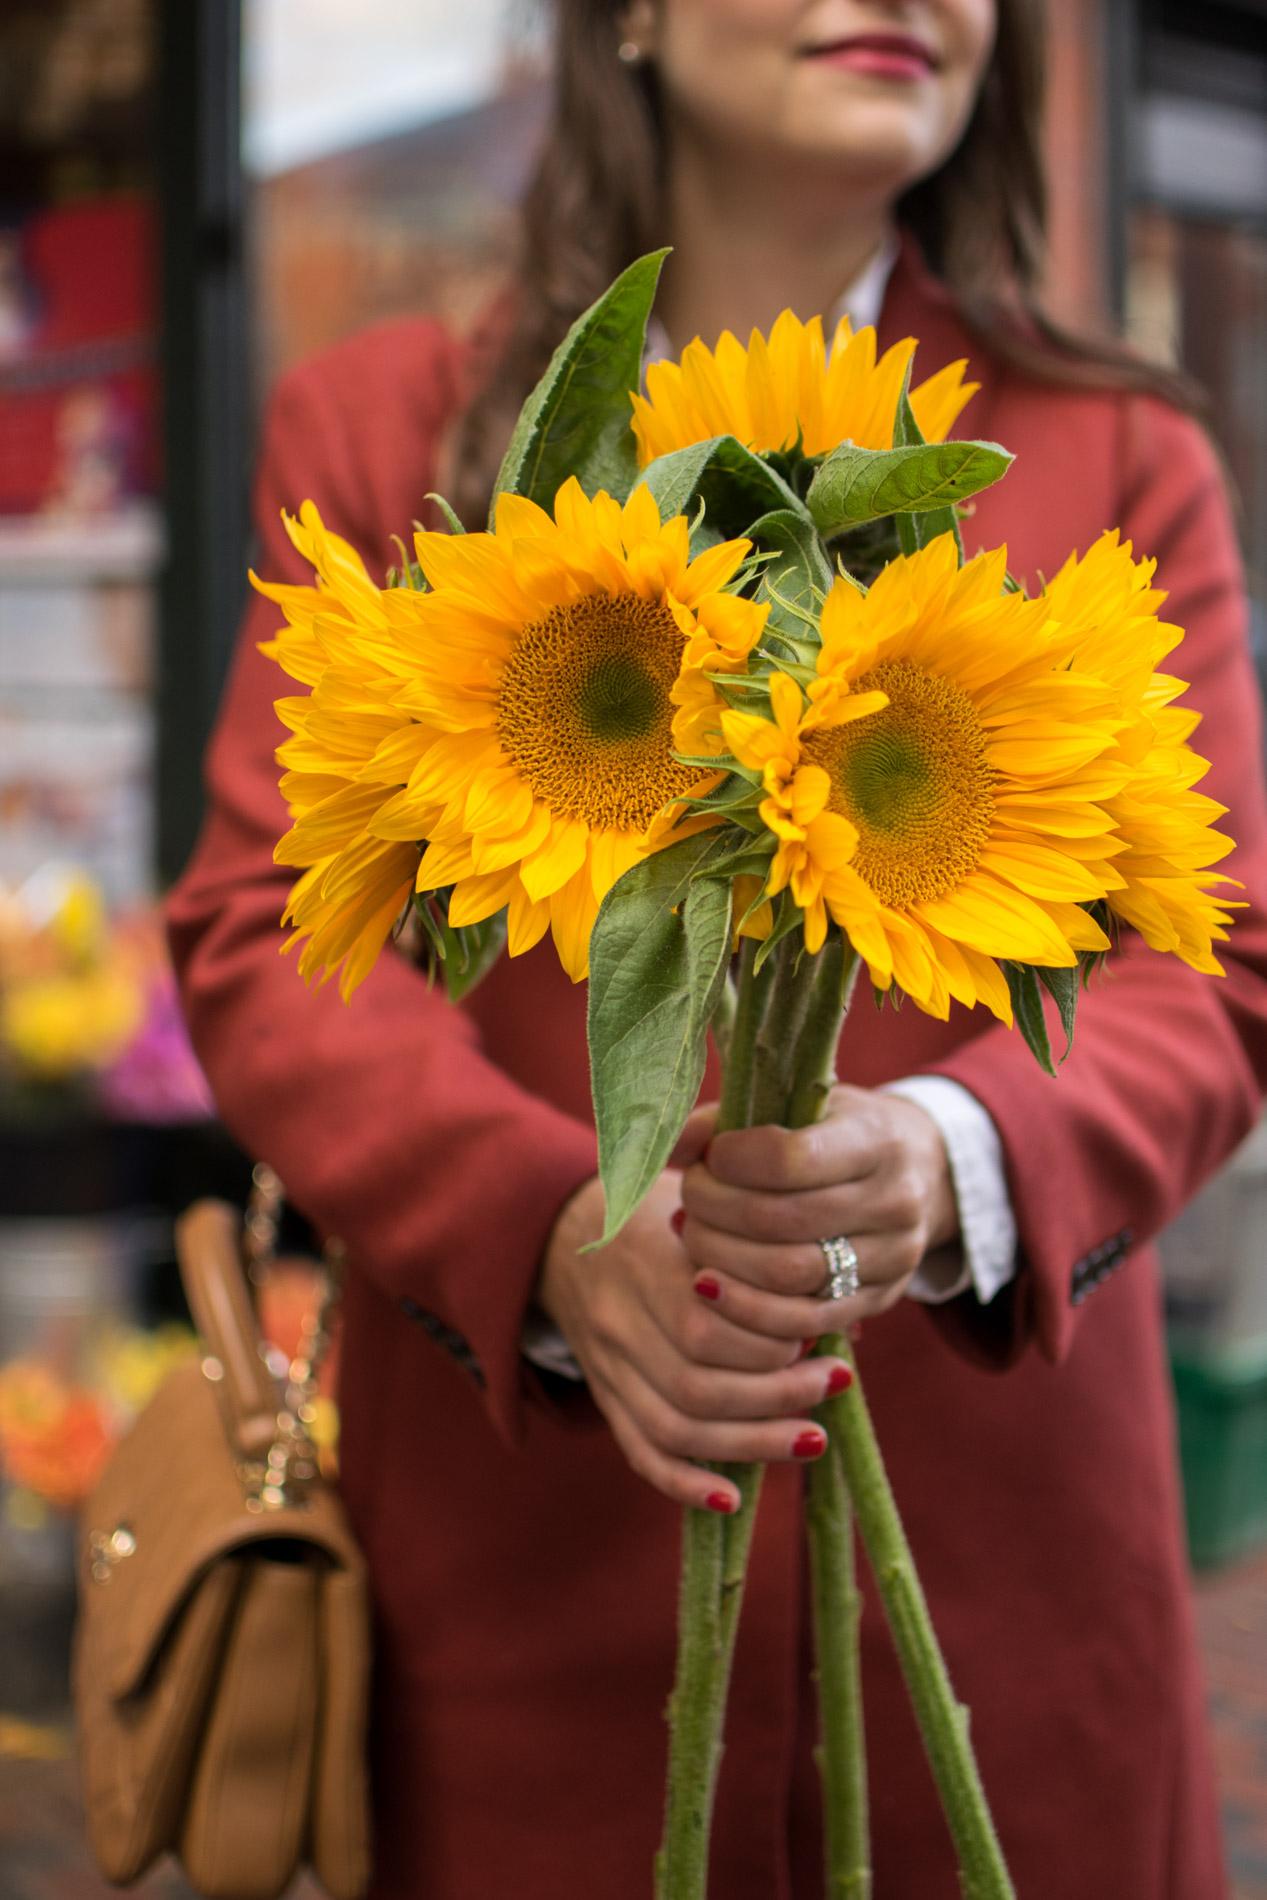 sunflowers, siena farms boston, fall in boston, the-alyst.com